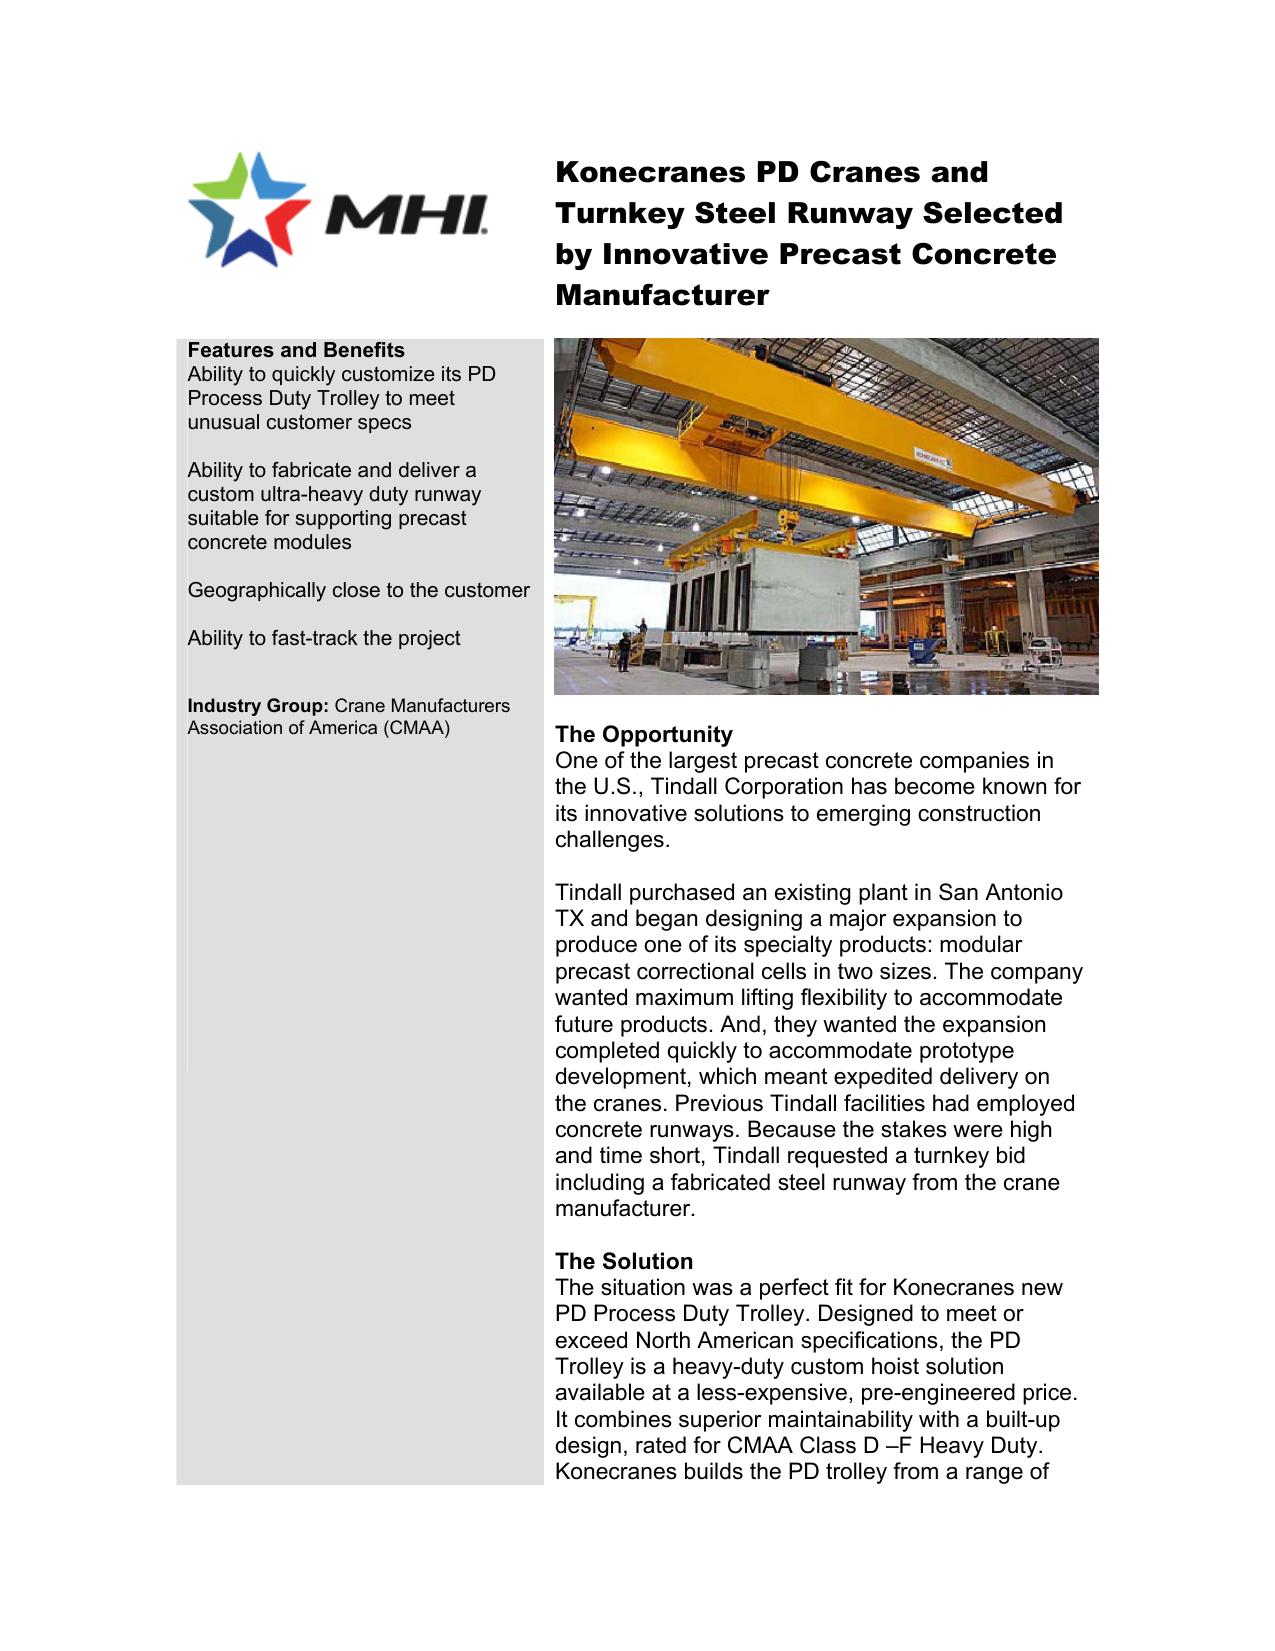 Konecranes PD Cranes and Turnkey Steel Runway Selected